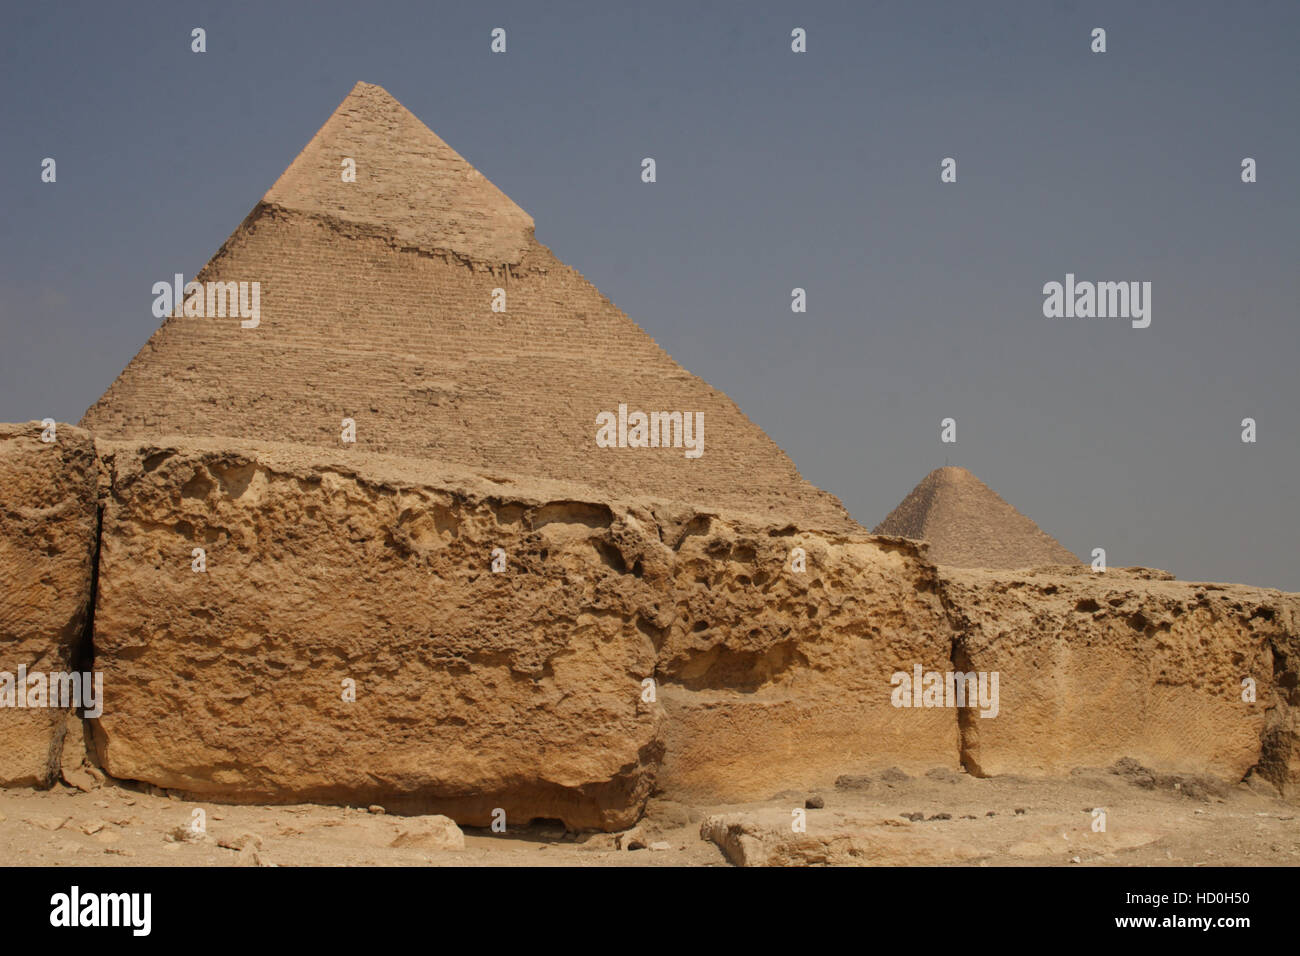 Pyramid area, Giza, Egypt - Stock Image